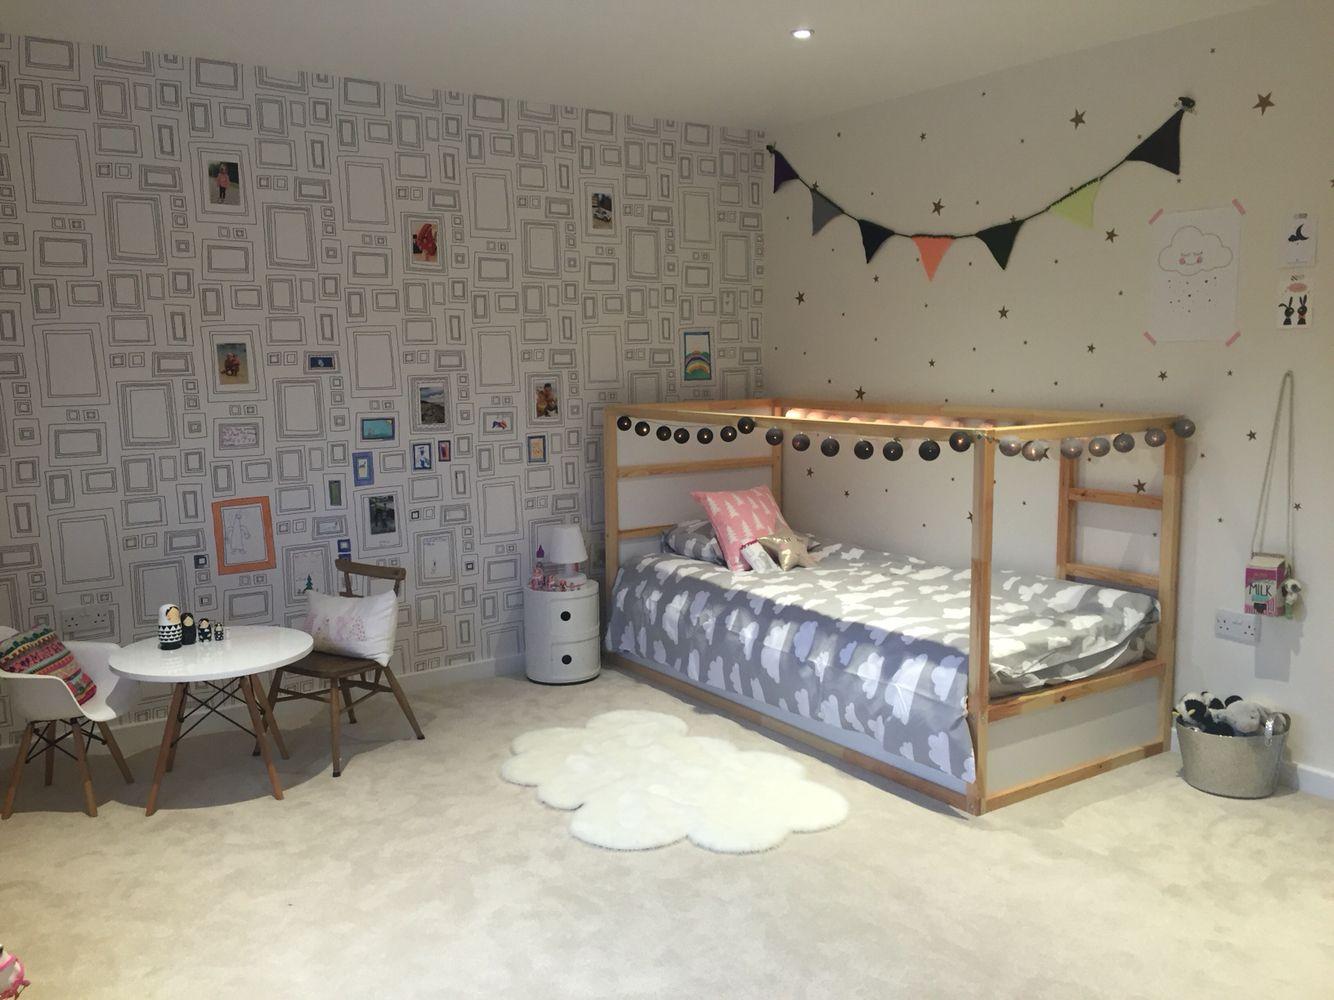 ikea kura bed, graham and brown frames wallpaper | sproetje slaap